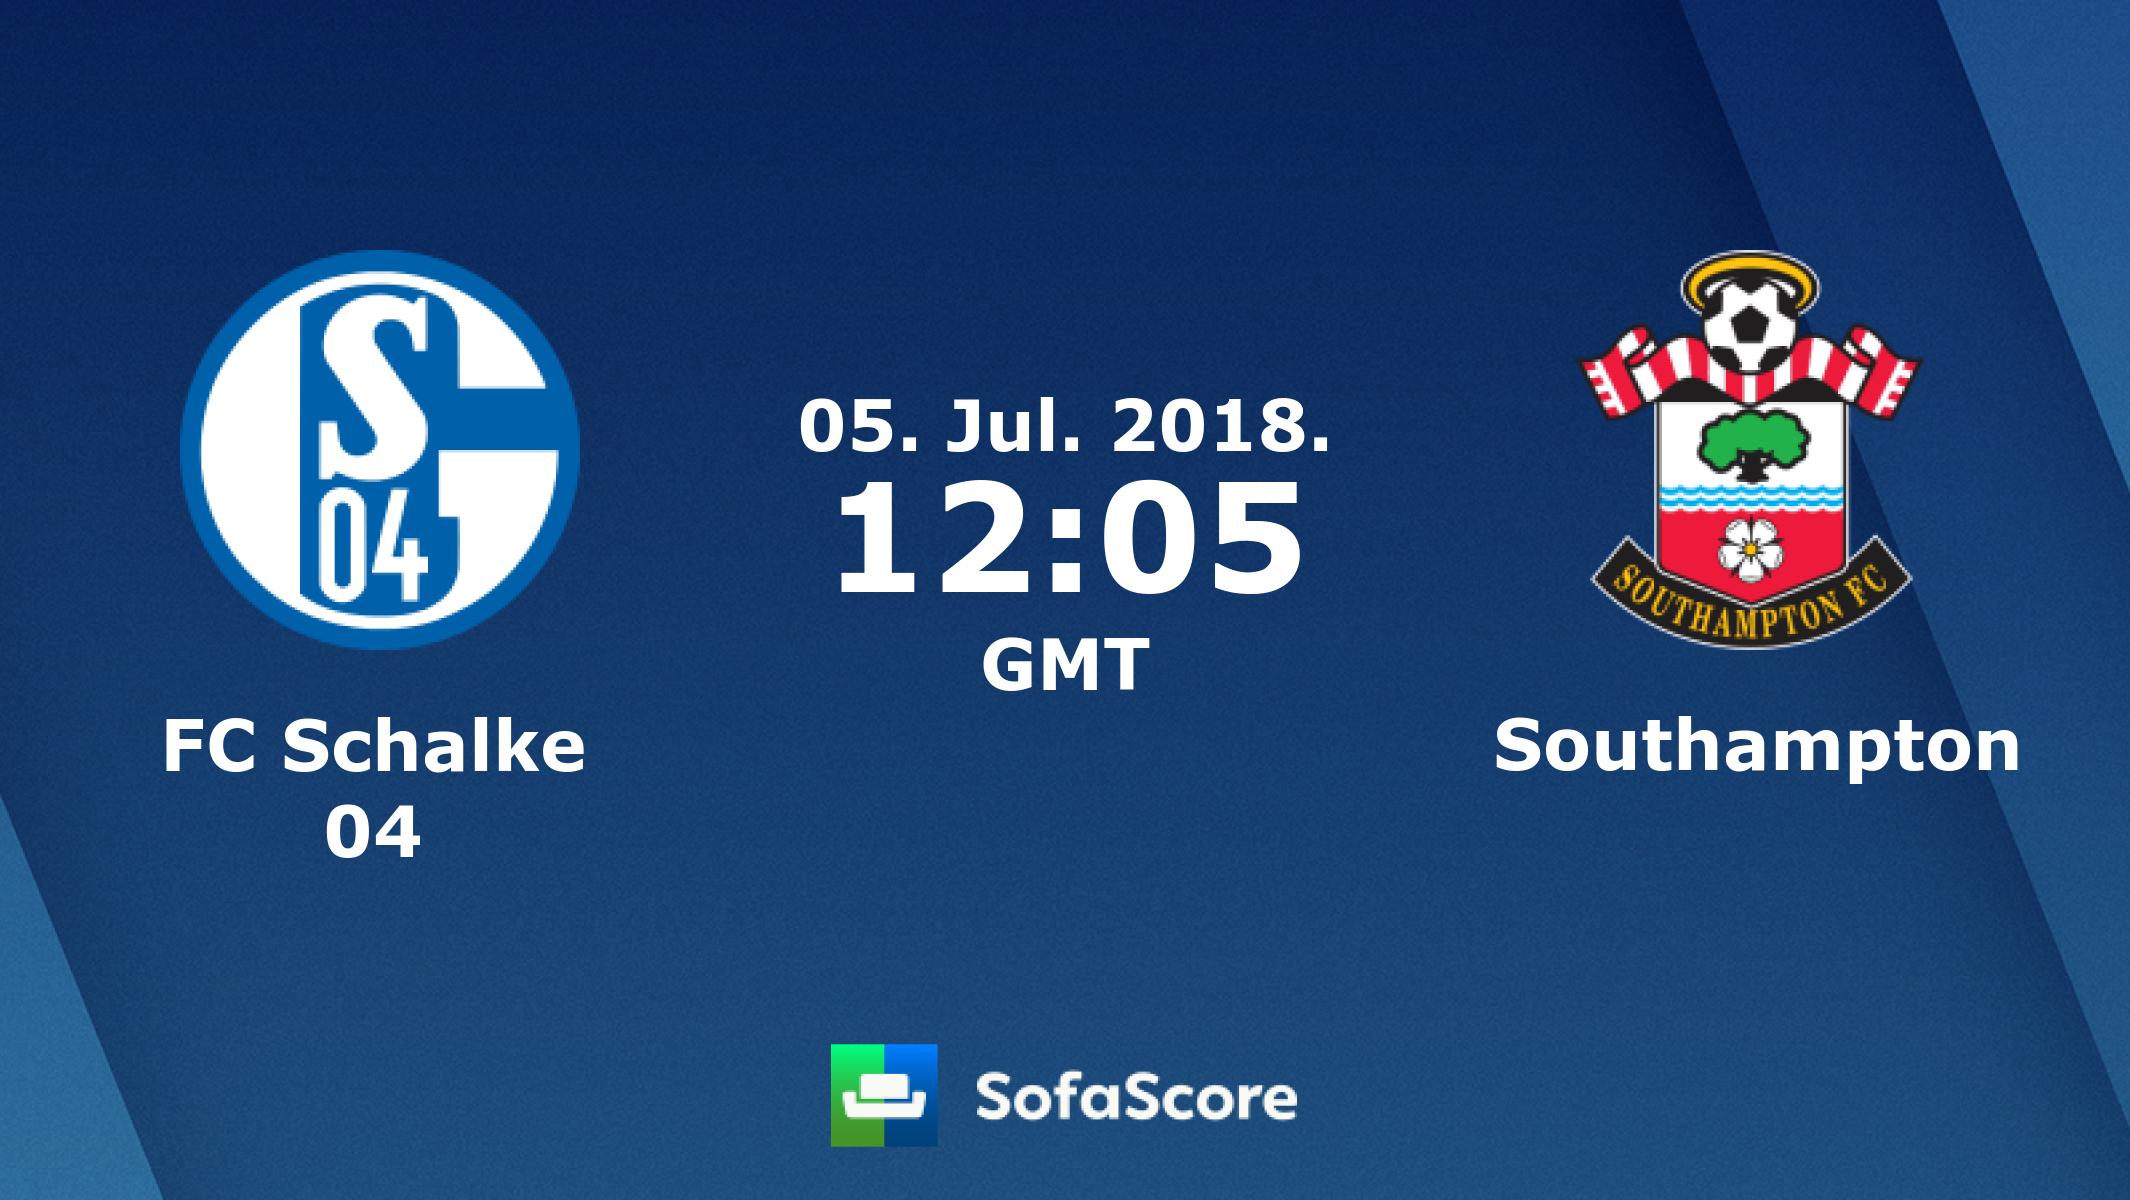 Nhận định Schalke vs Southampton, 19h05 ngày 5/7: Giải tỏa sức ì